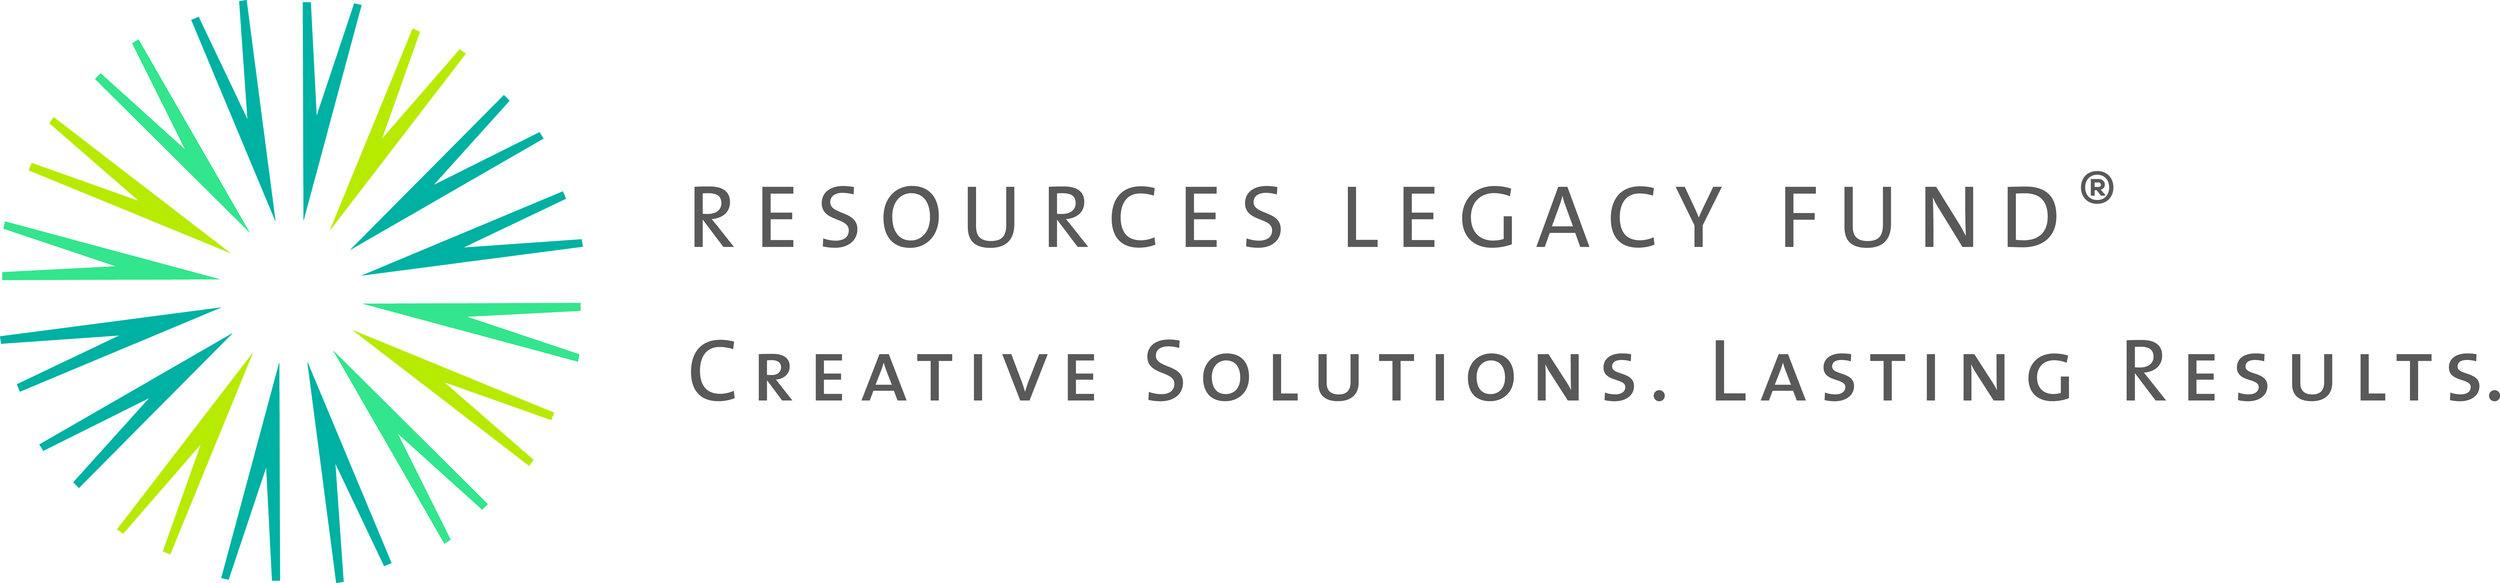 RLF_ Slogan Logo_CMYK_Registered.jpg